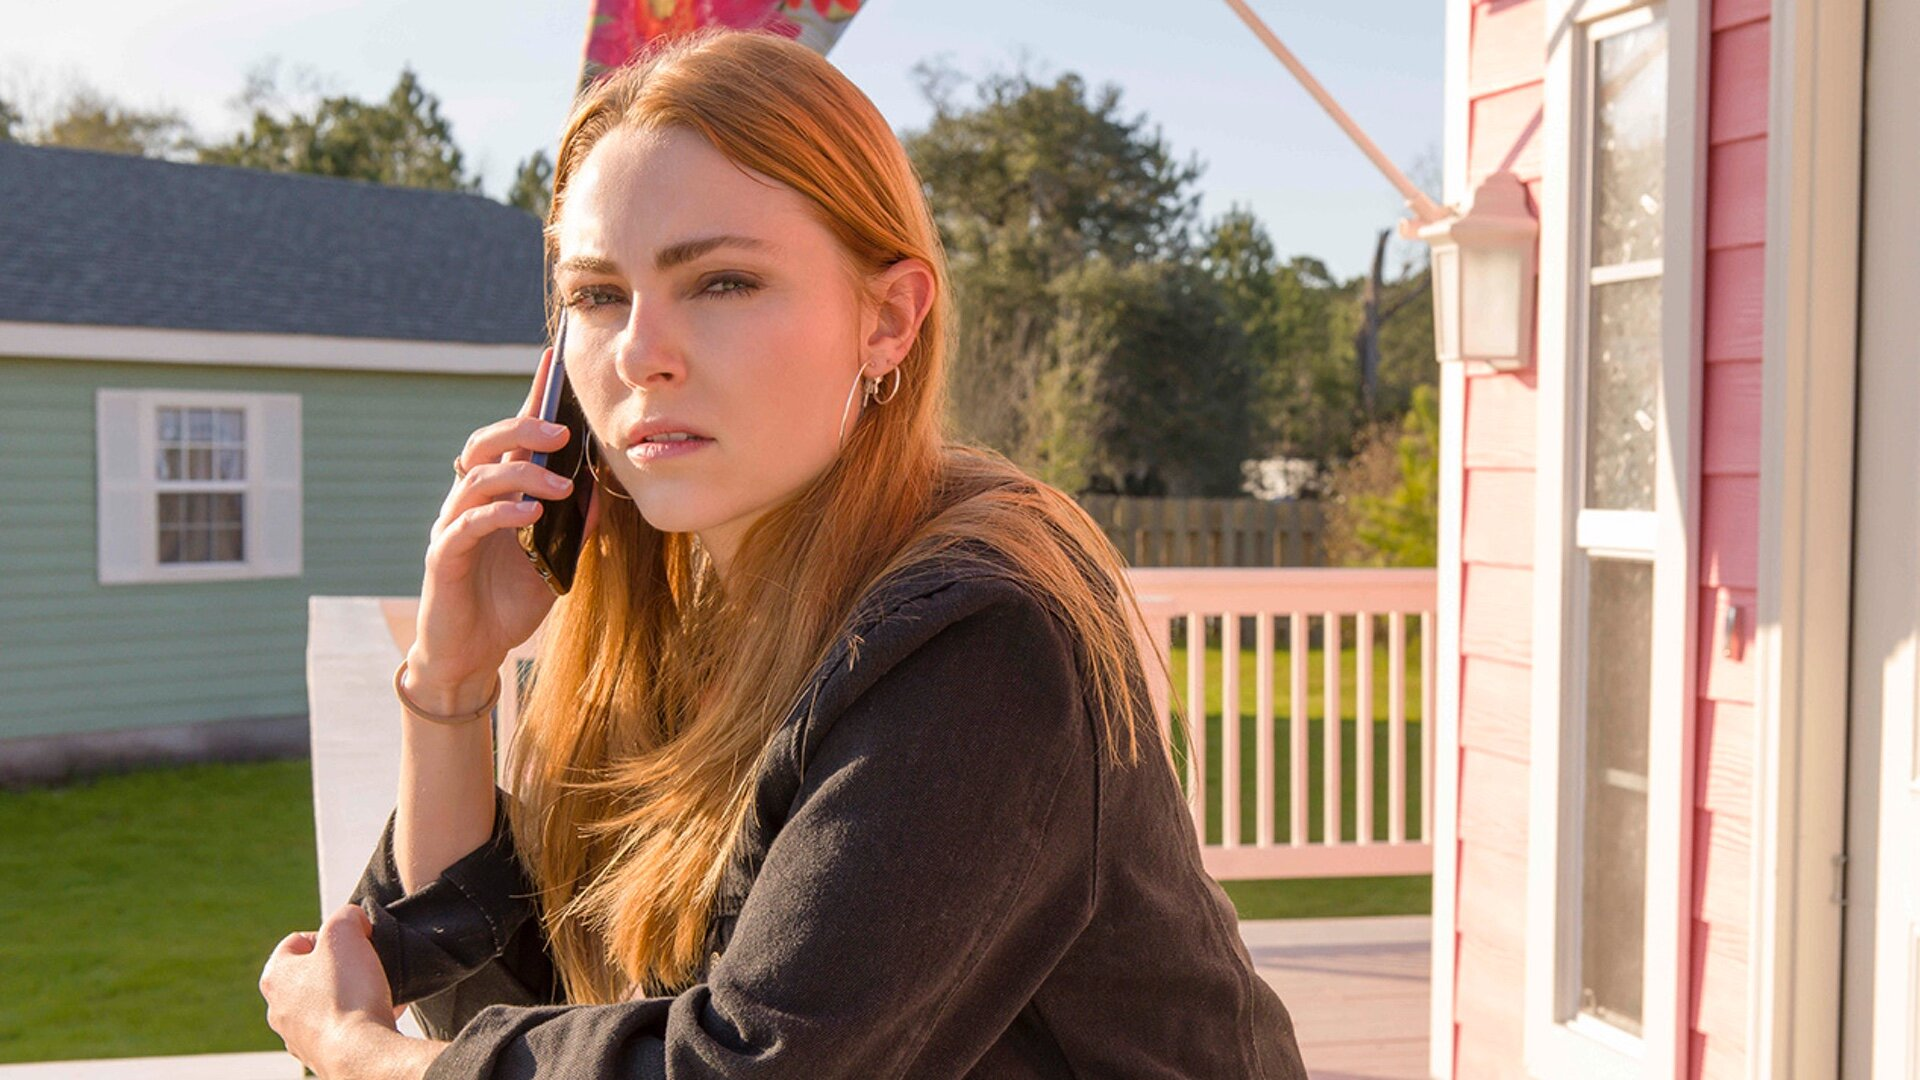 AnnaSophia Robb Set To Star in a New Horror Series Called EMMA — GeekTyrant